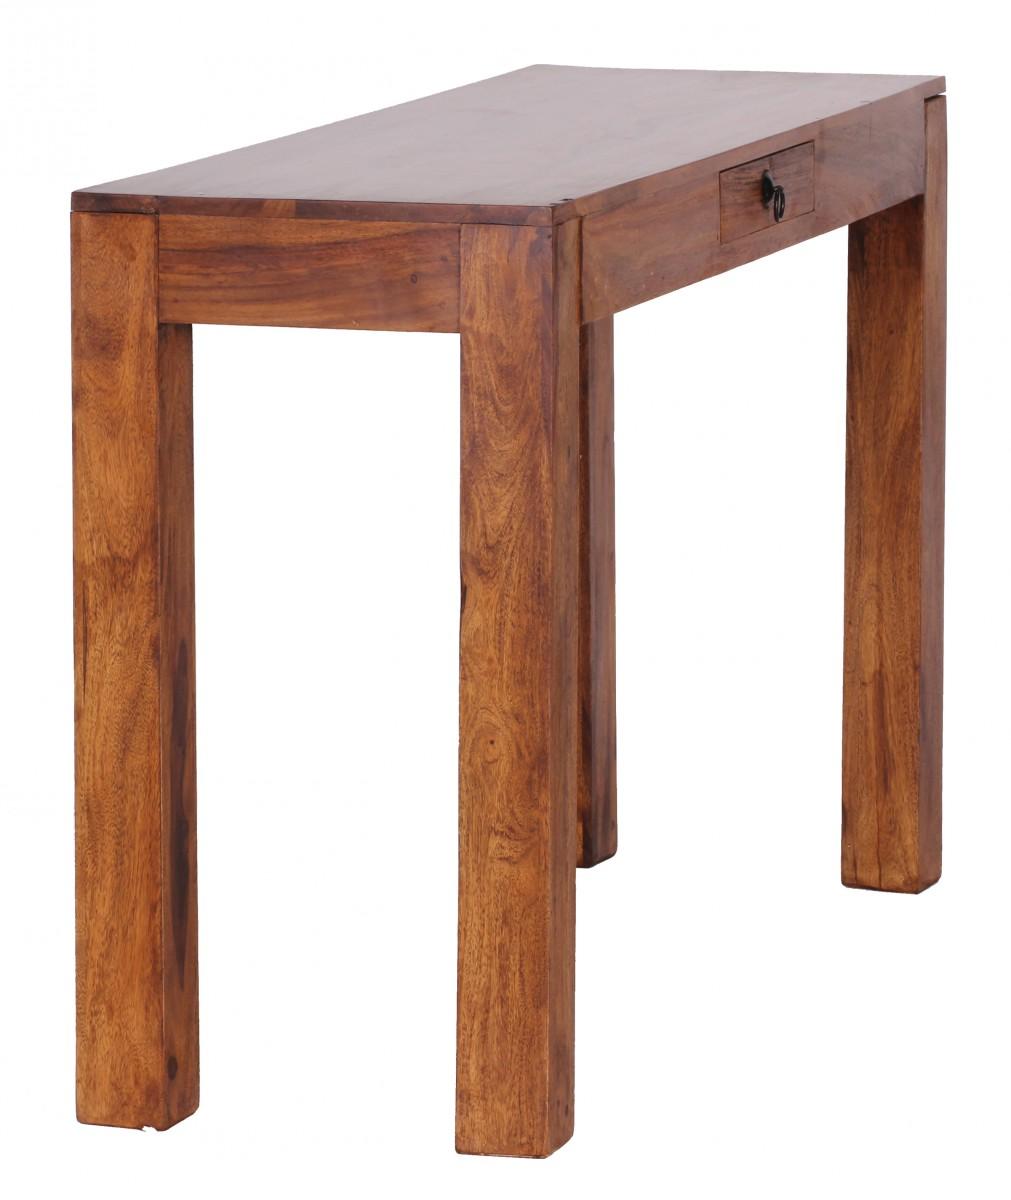 Wohnling palissandre table console solides 120 cm avec 1 for Table en palissandre massif